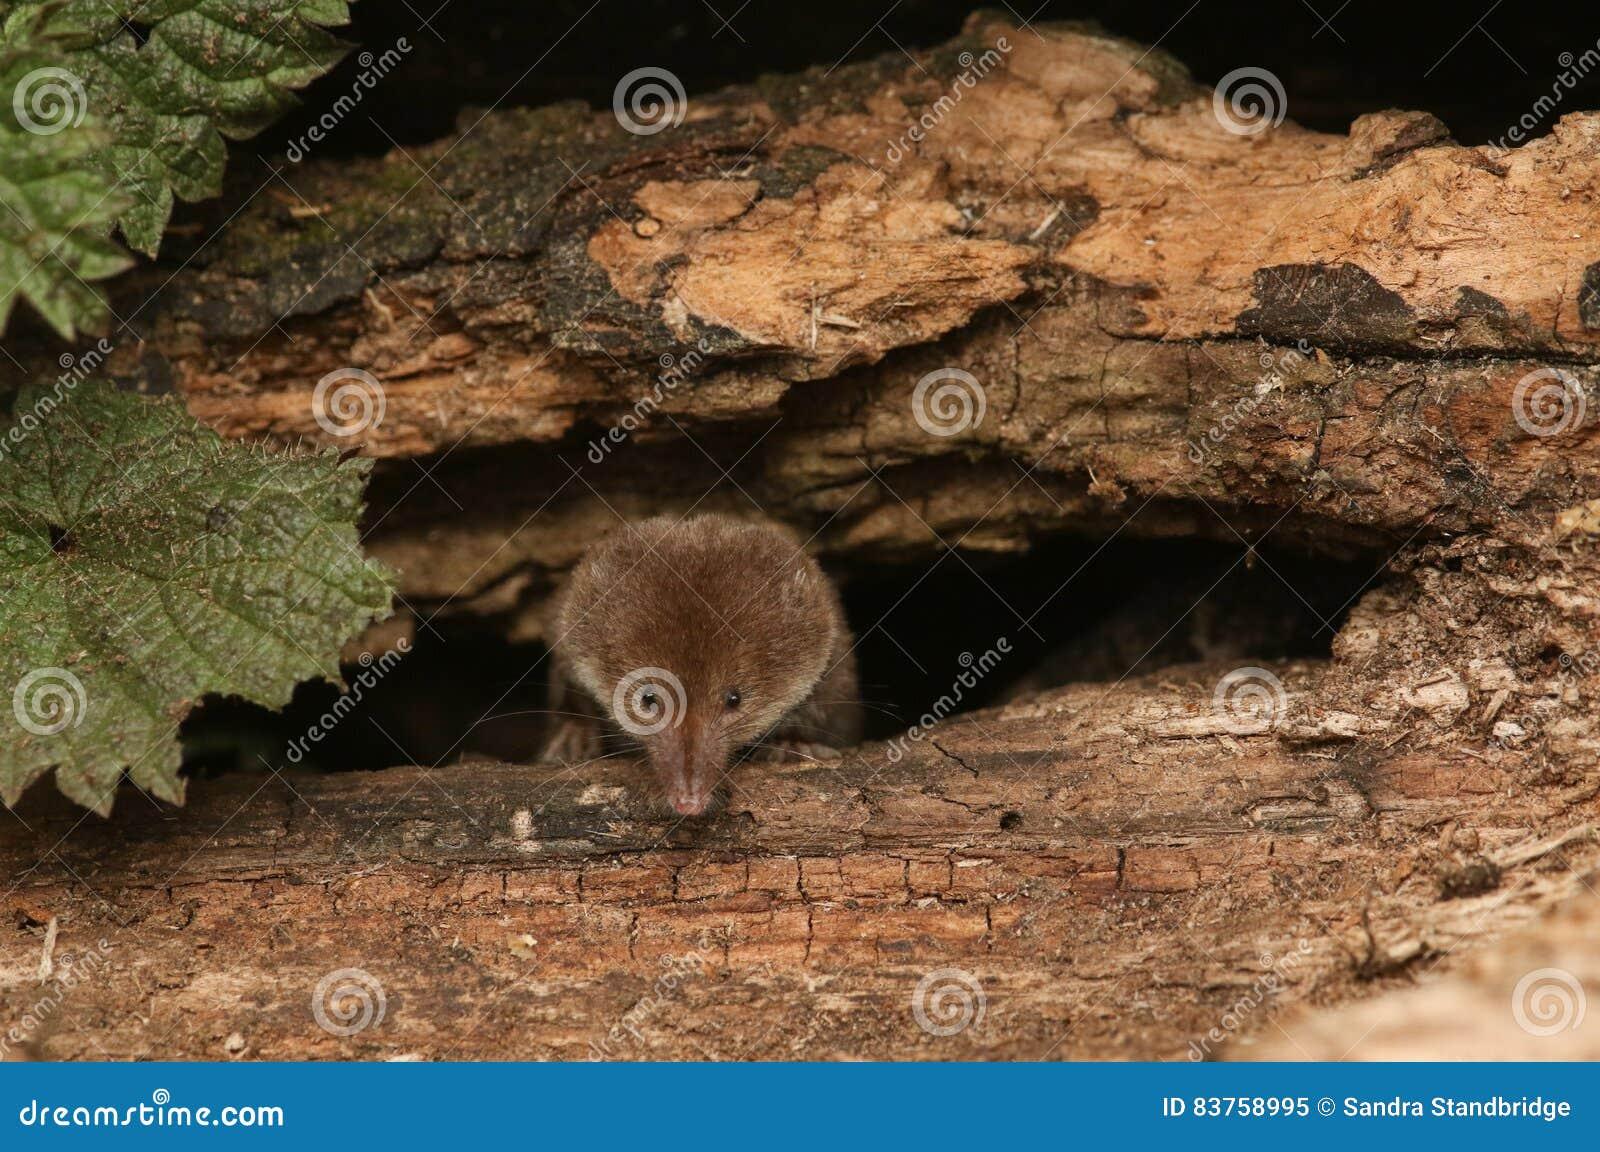 A hunting Common Shrew Sorex araneus.